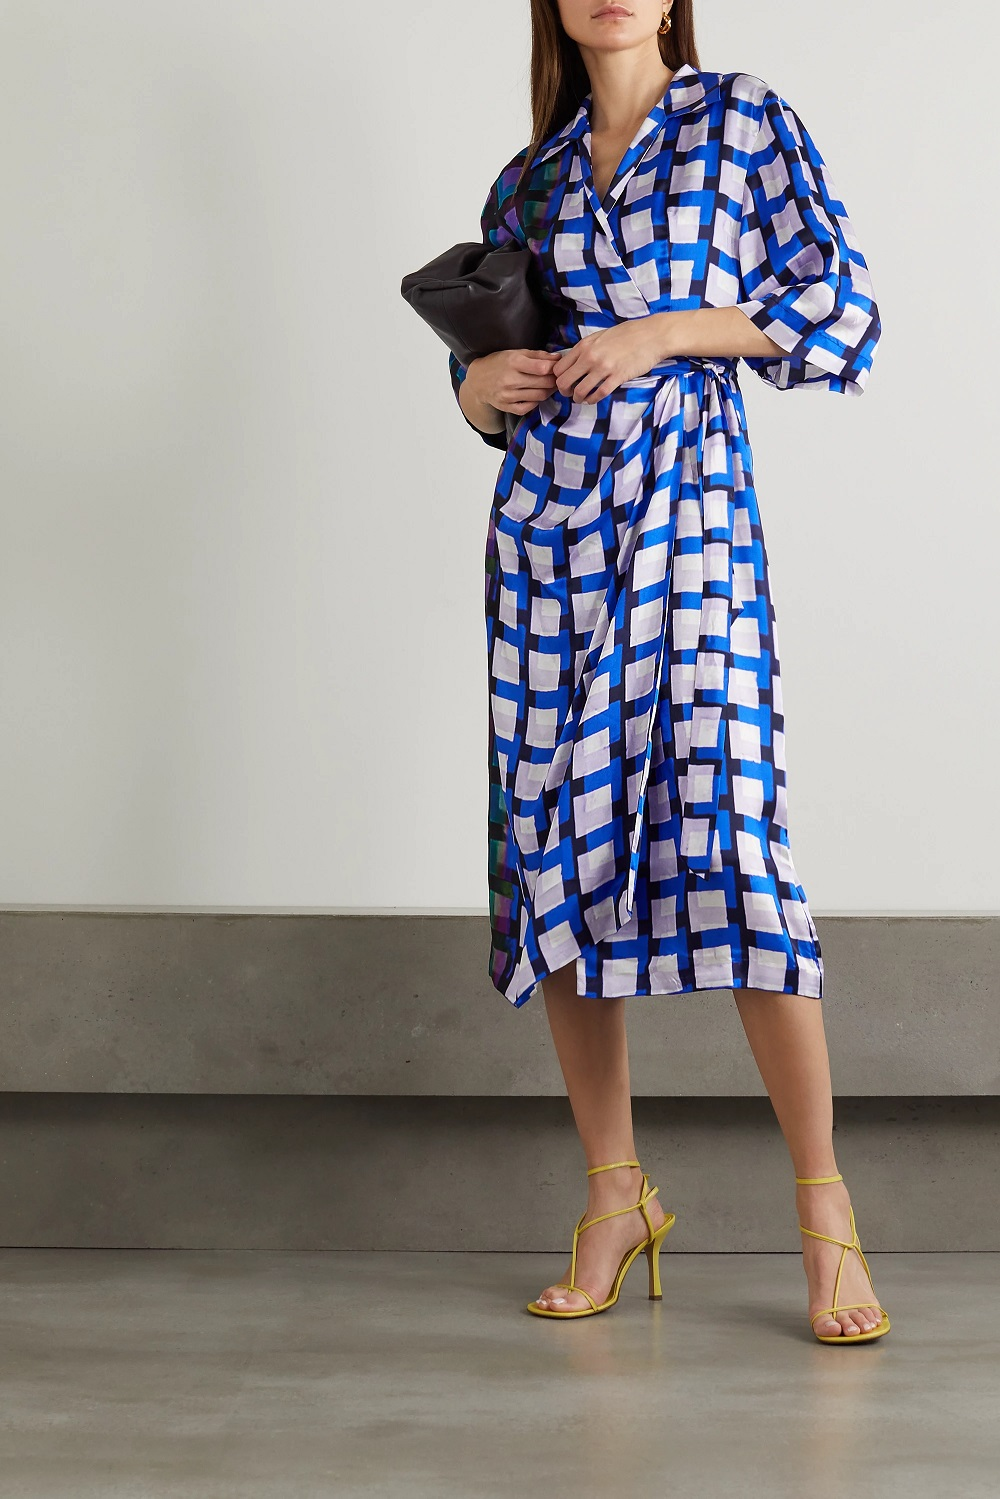 Dries Van Noten midi haljina proljeće/ljeto 2021.